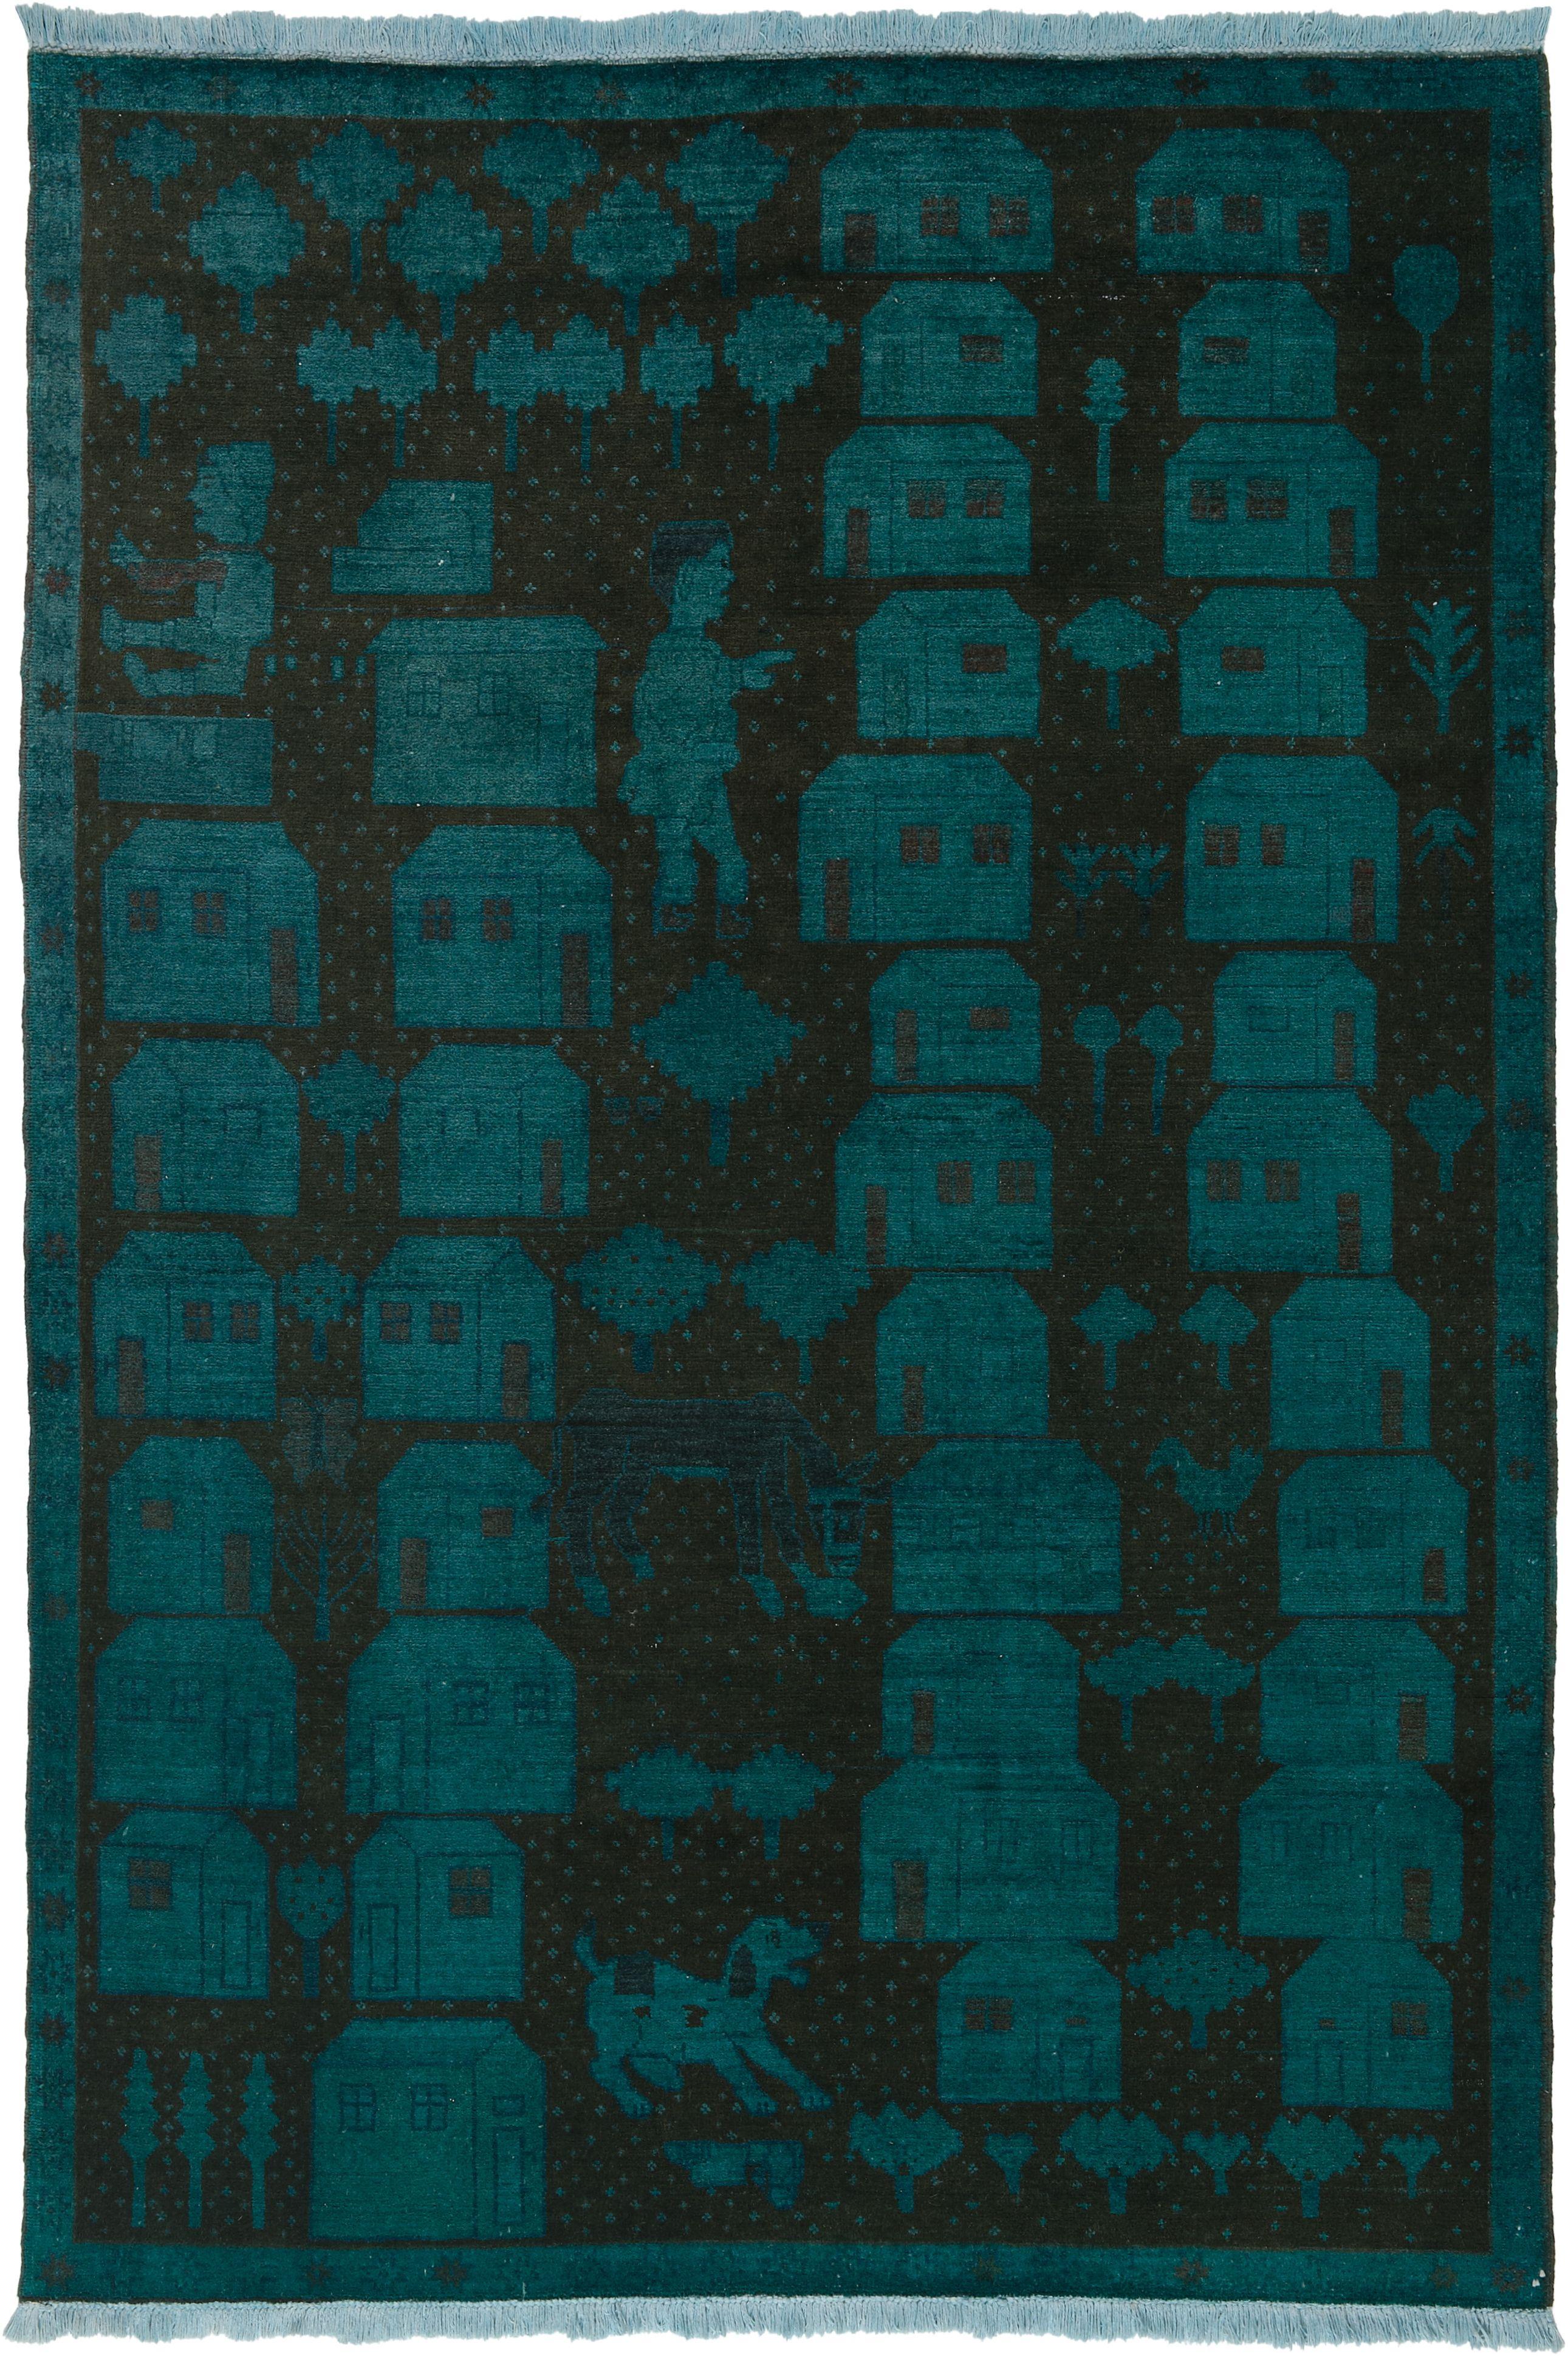 Blau (-er) Teppich by KISKAN PROCESS HAMBURG, Orientteppich ...